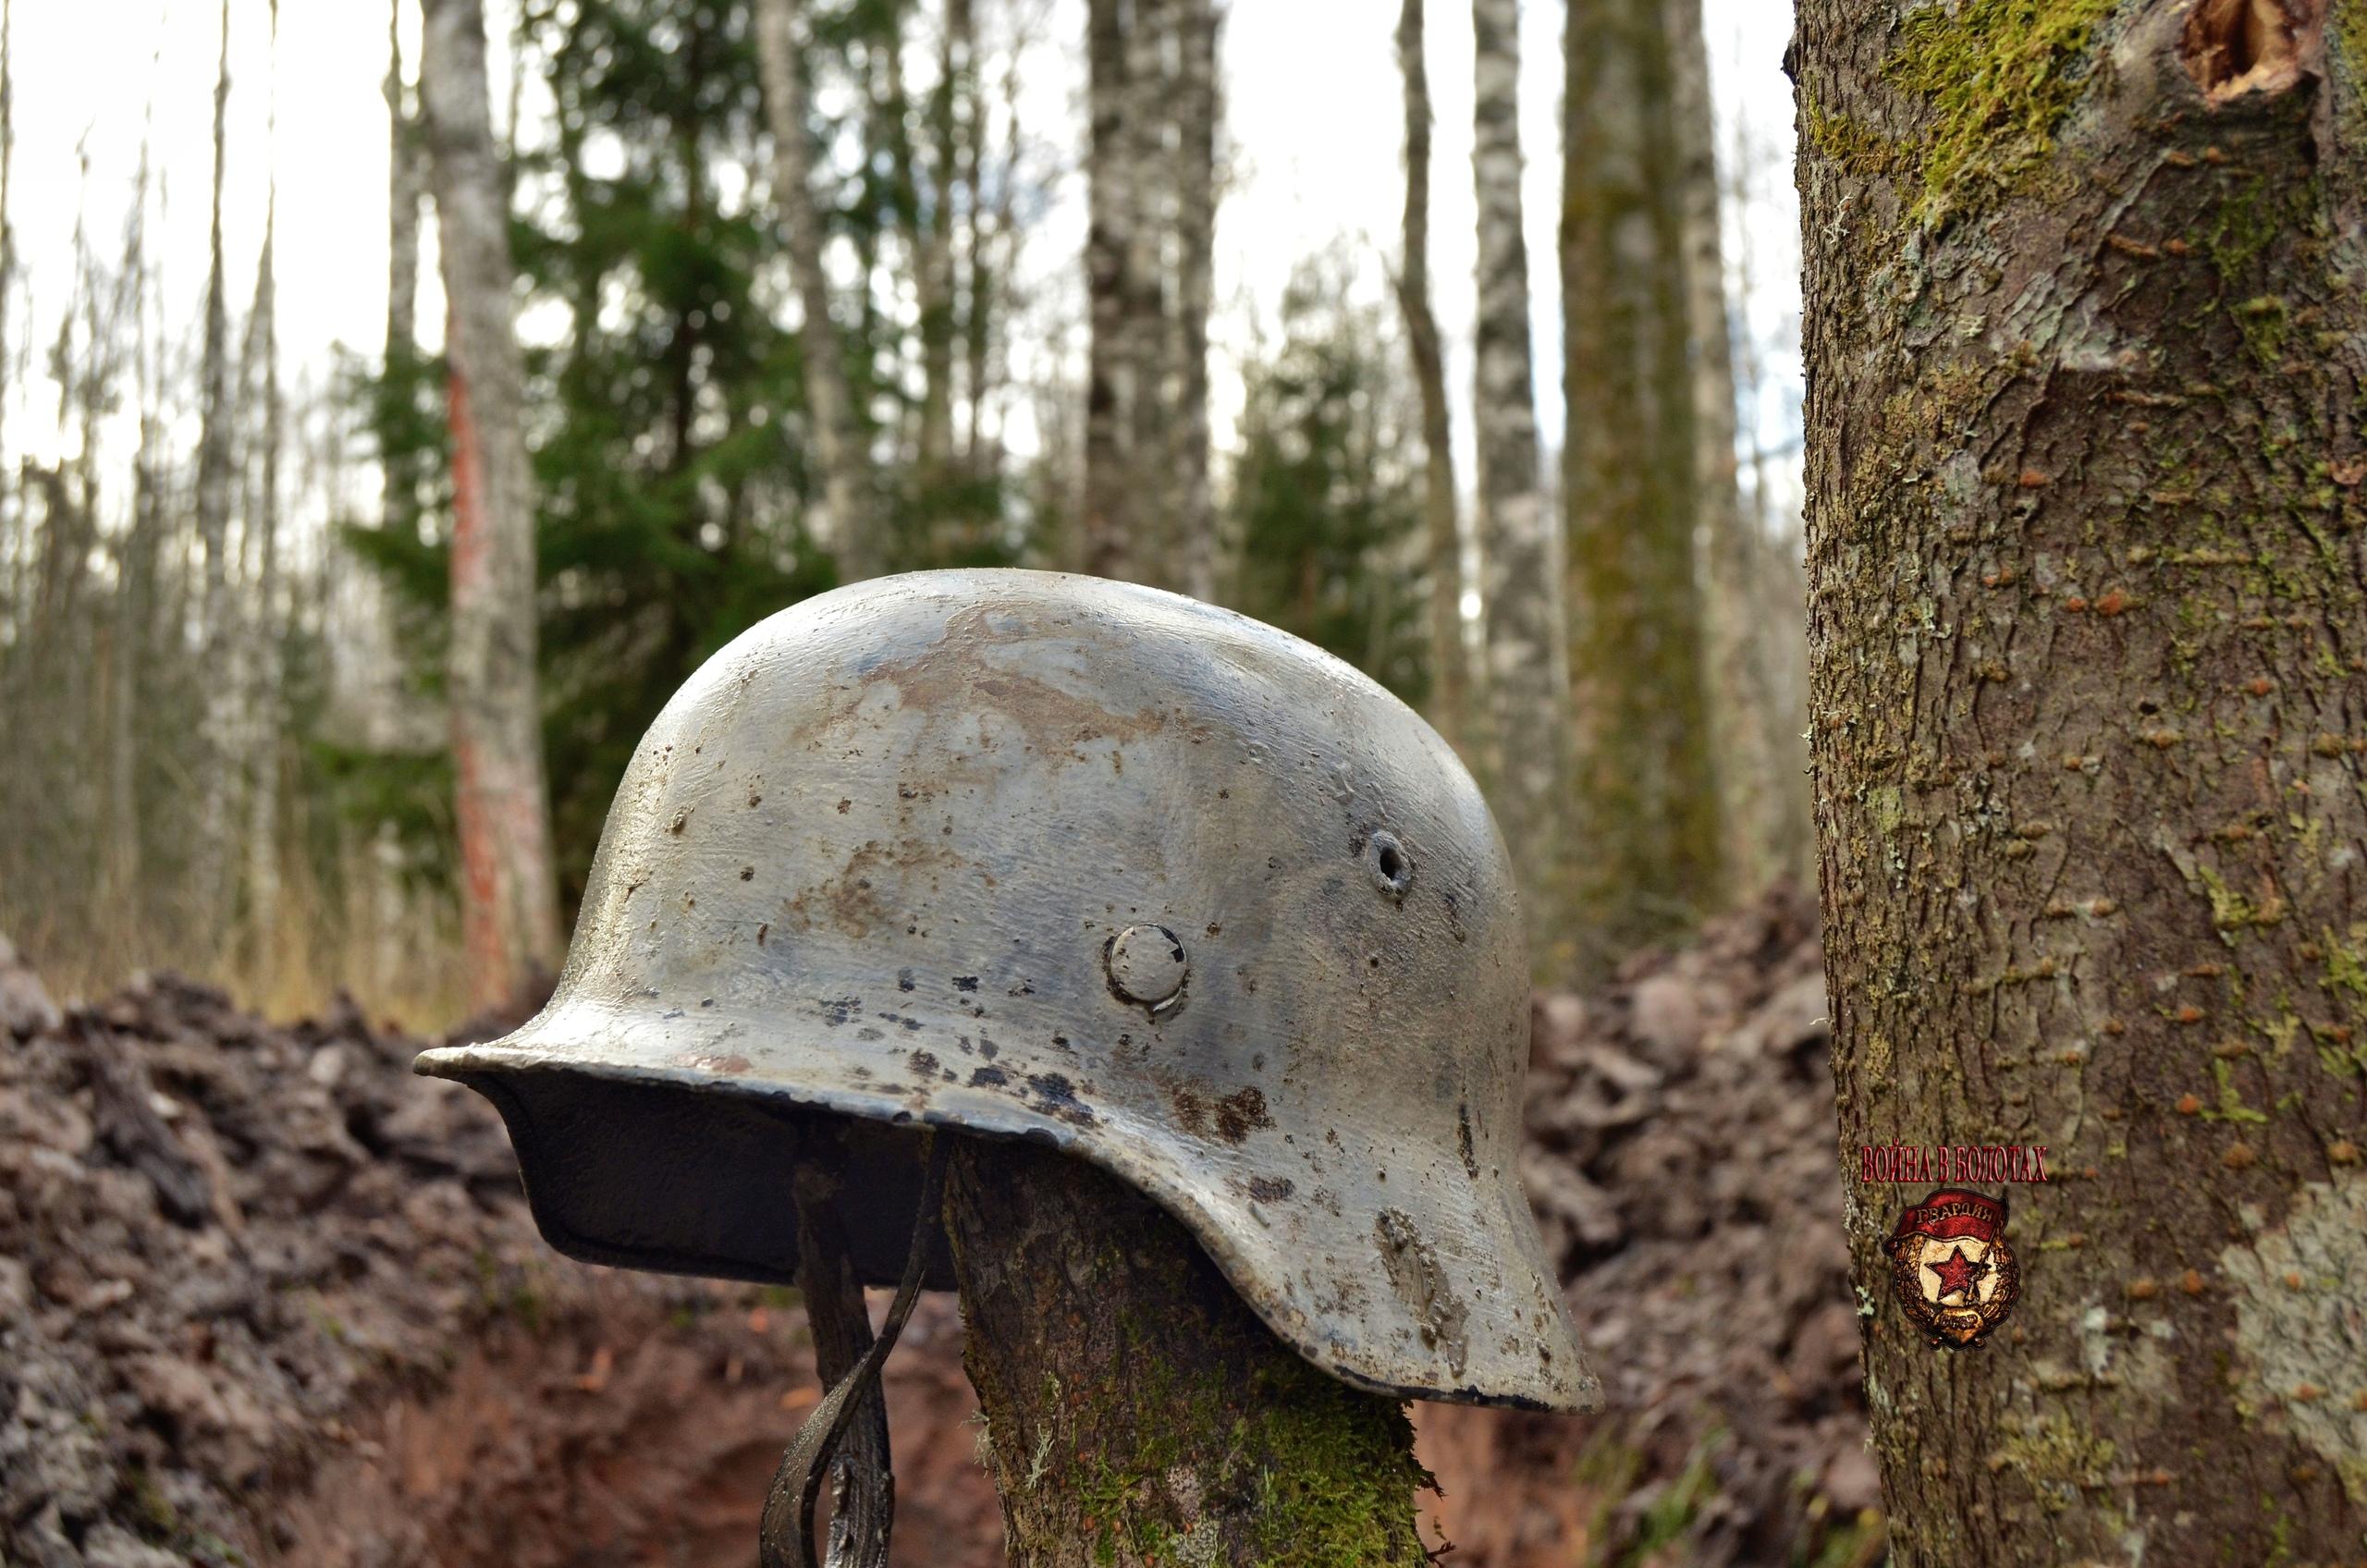 German helmet from dugout